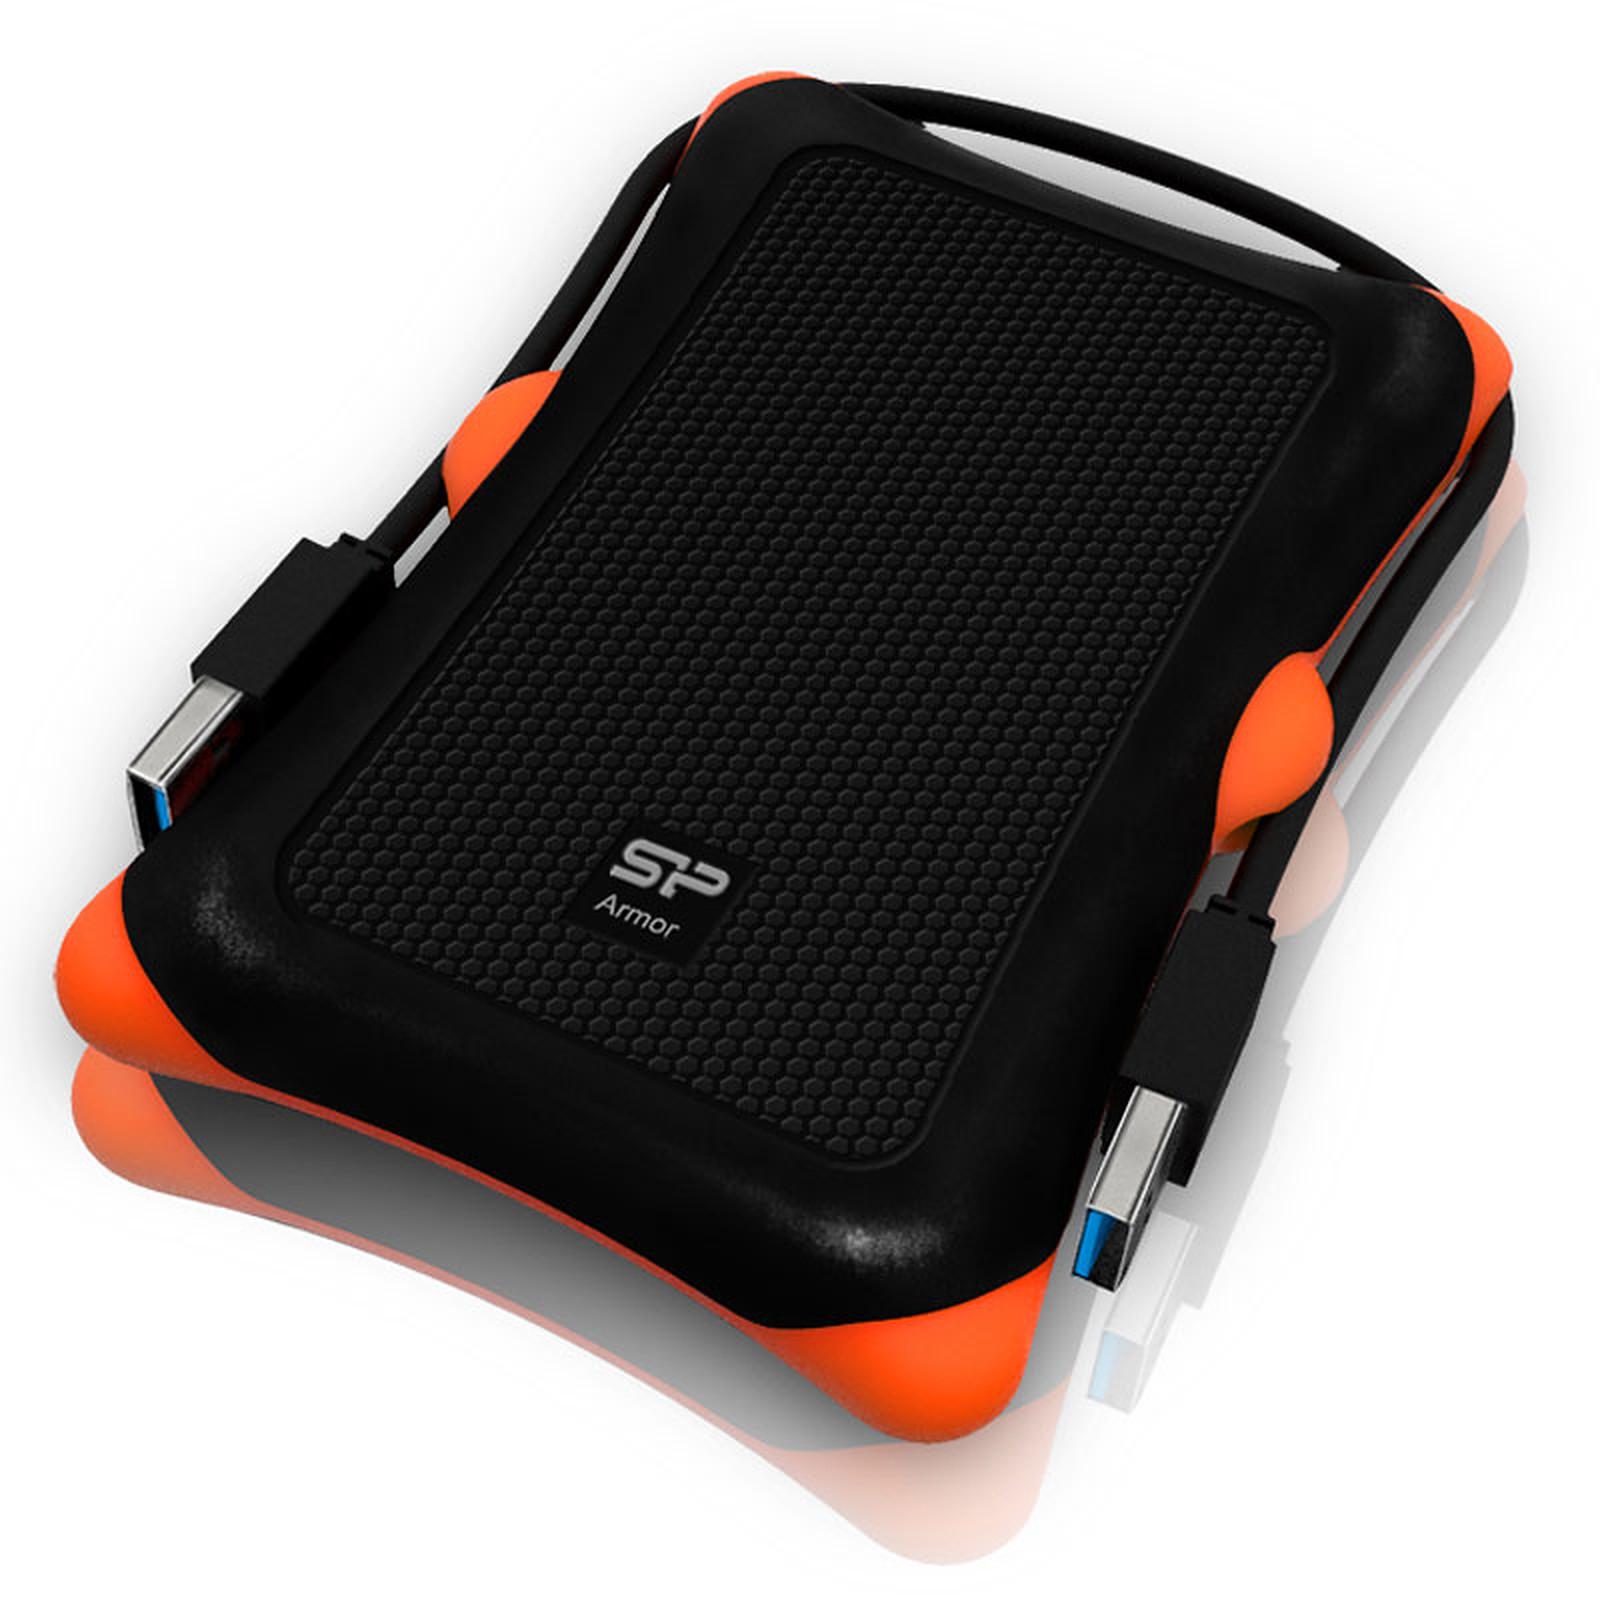 "LDLC SSD Externe 2.5"" USB 3.0 480 Go"